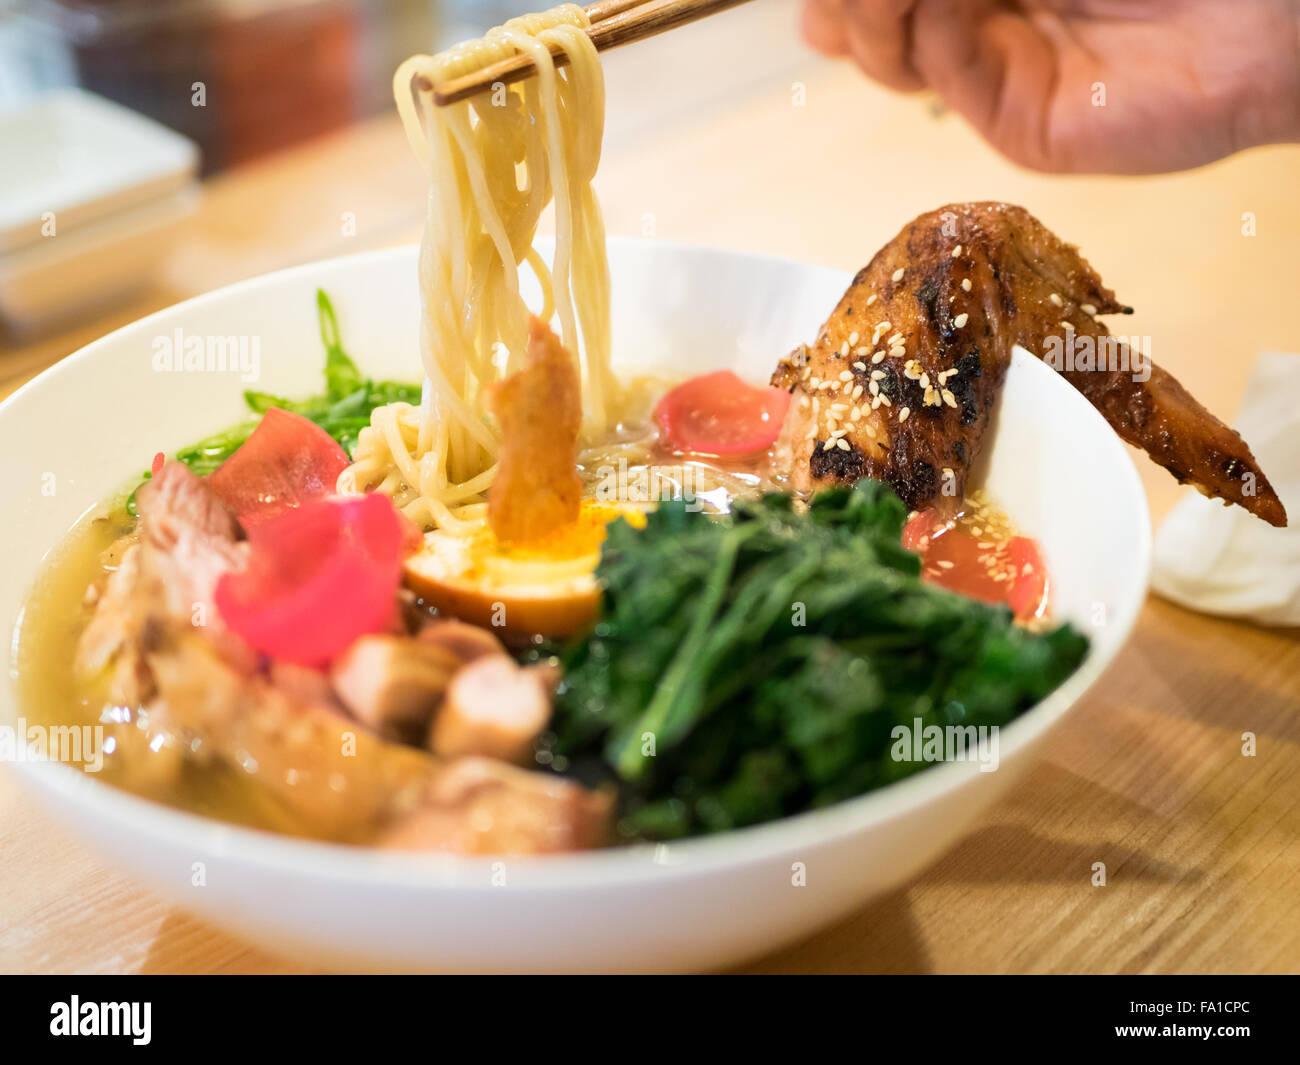 Japanese ramen noodles (roasted barley chicken) from Prairie Noodle Shop in Edmonton, Alberta, Canada. Stock Photo